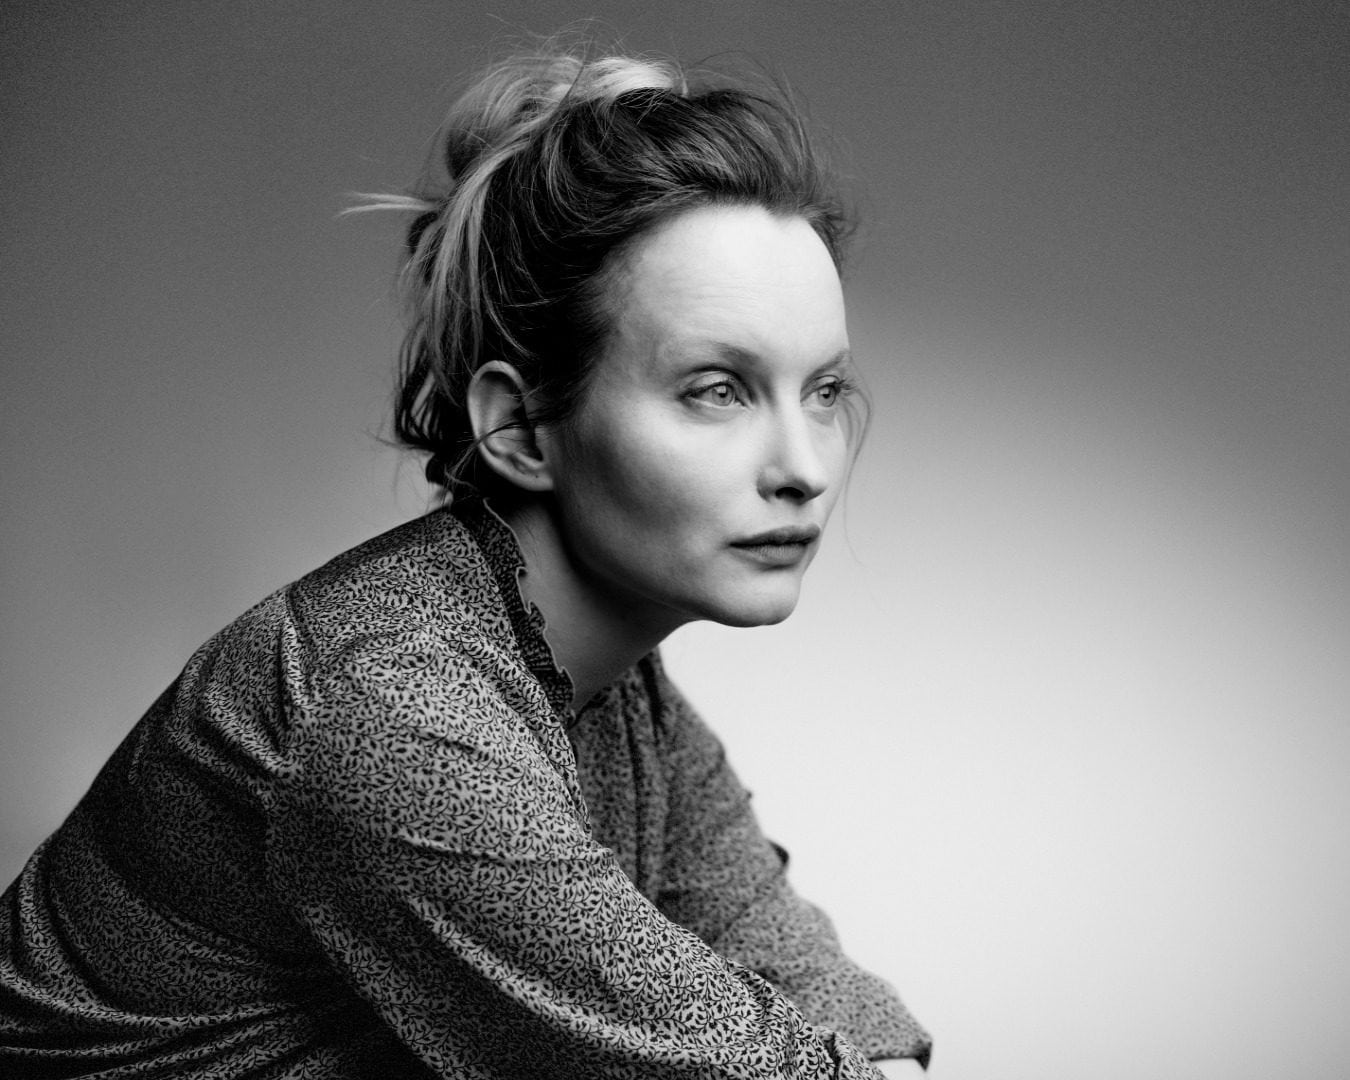 Anna Bache-Wiig Nude Photos 22